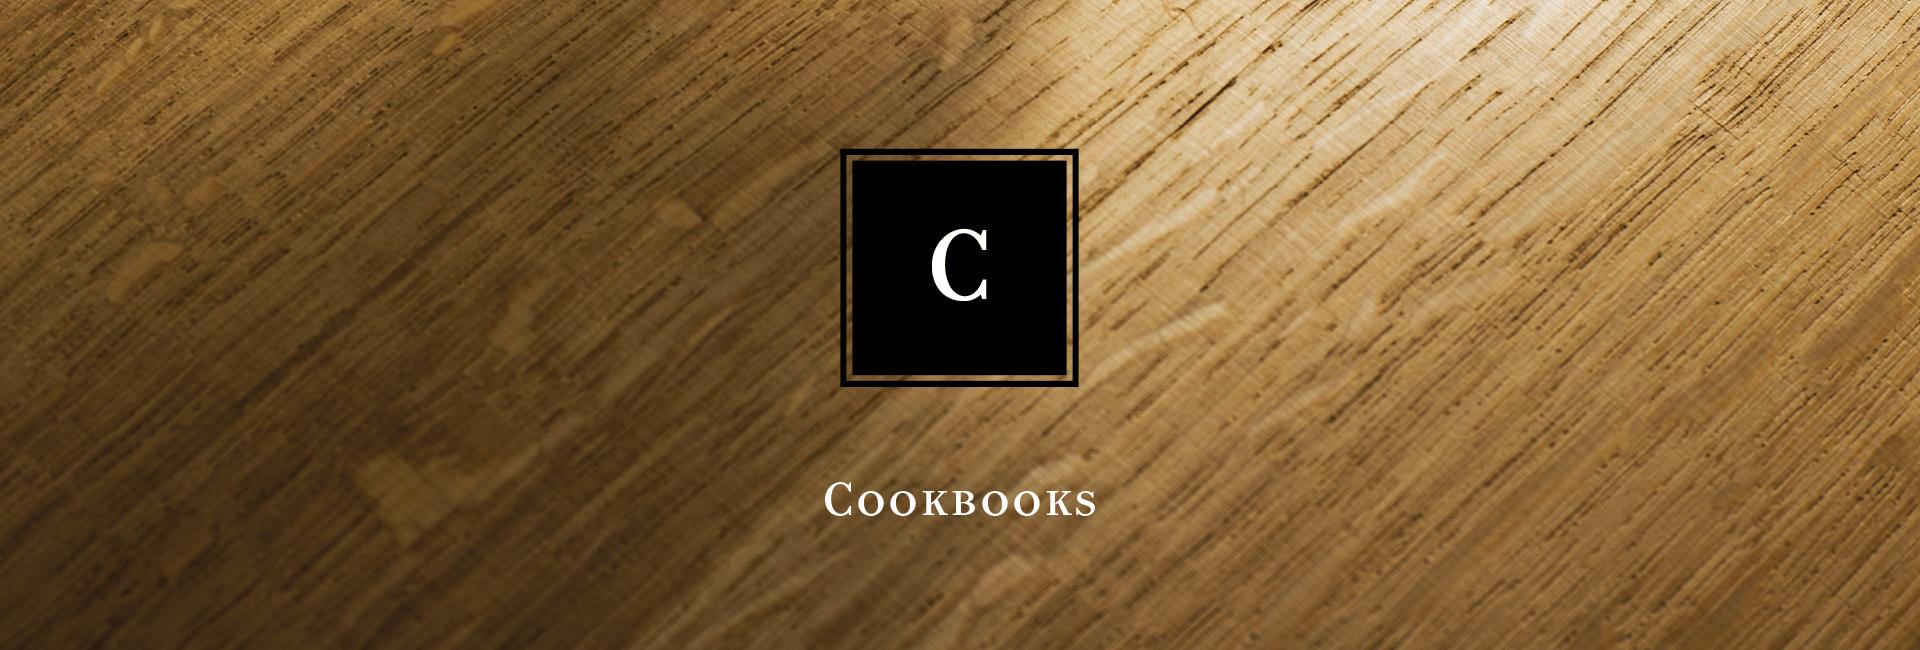 Vegan Cookbook Directory